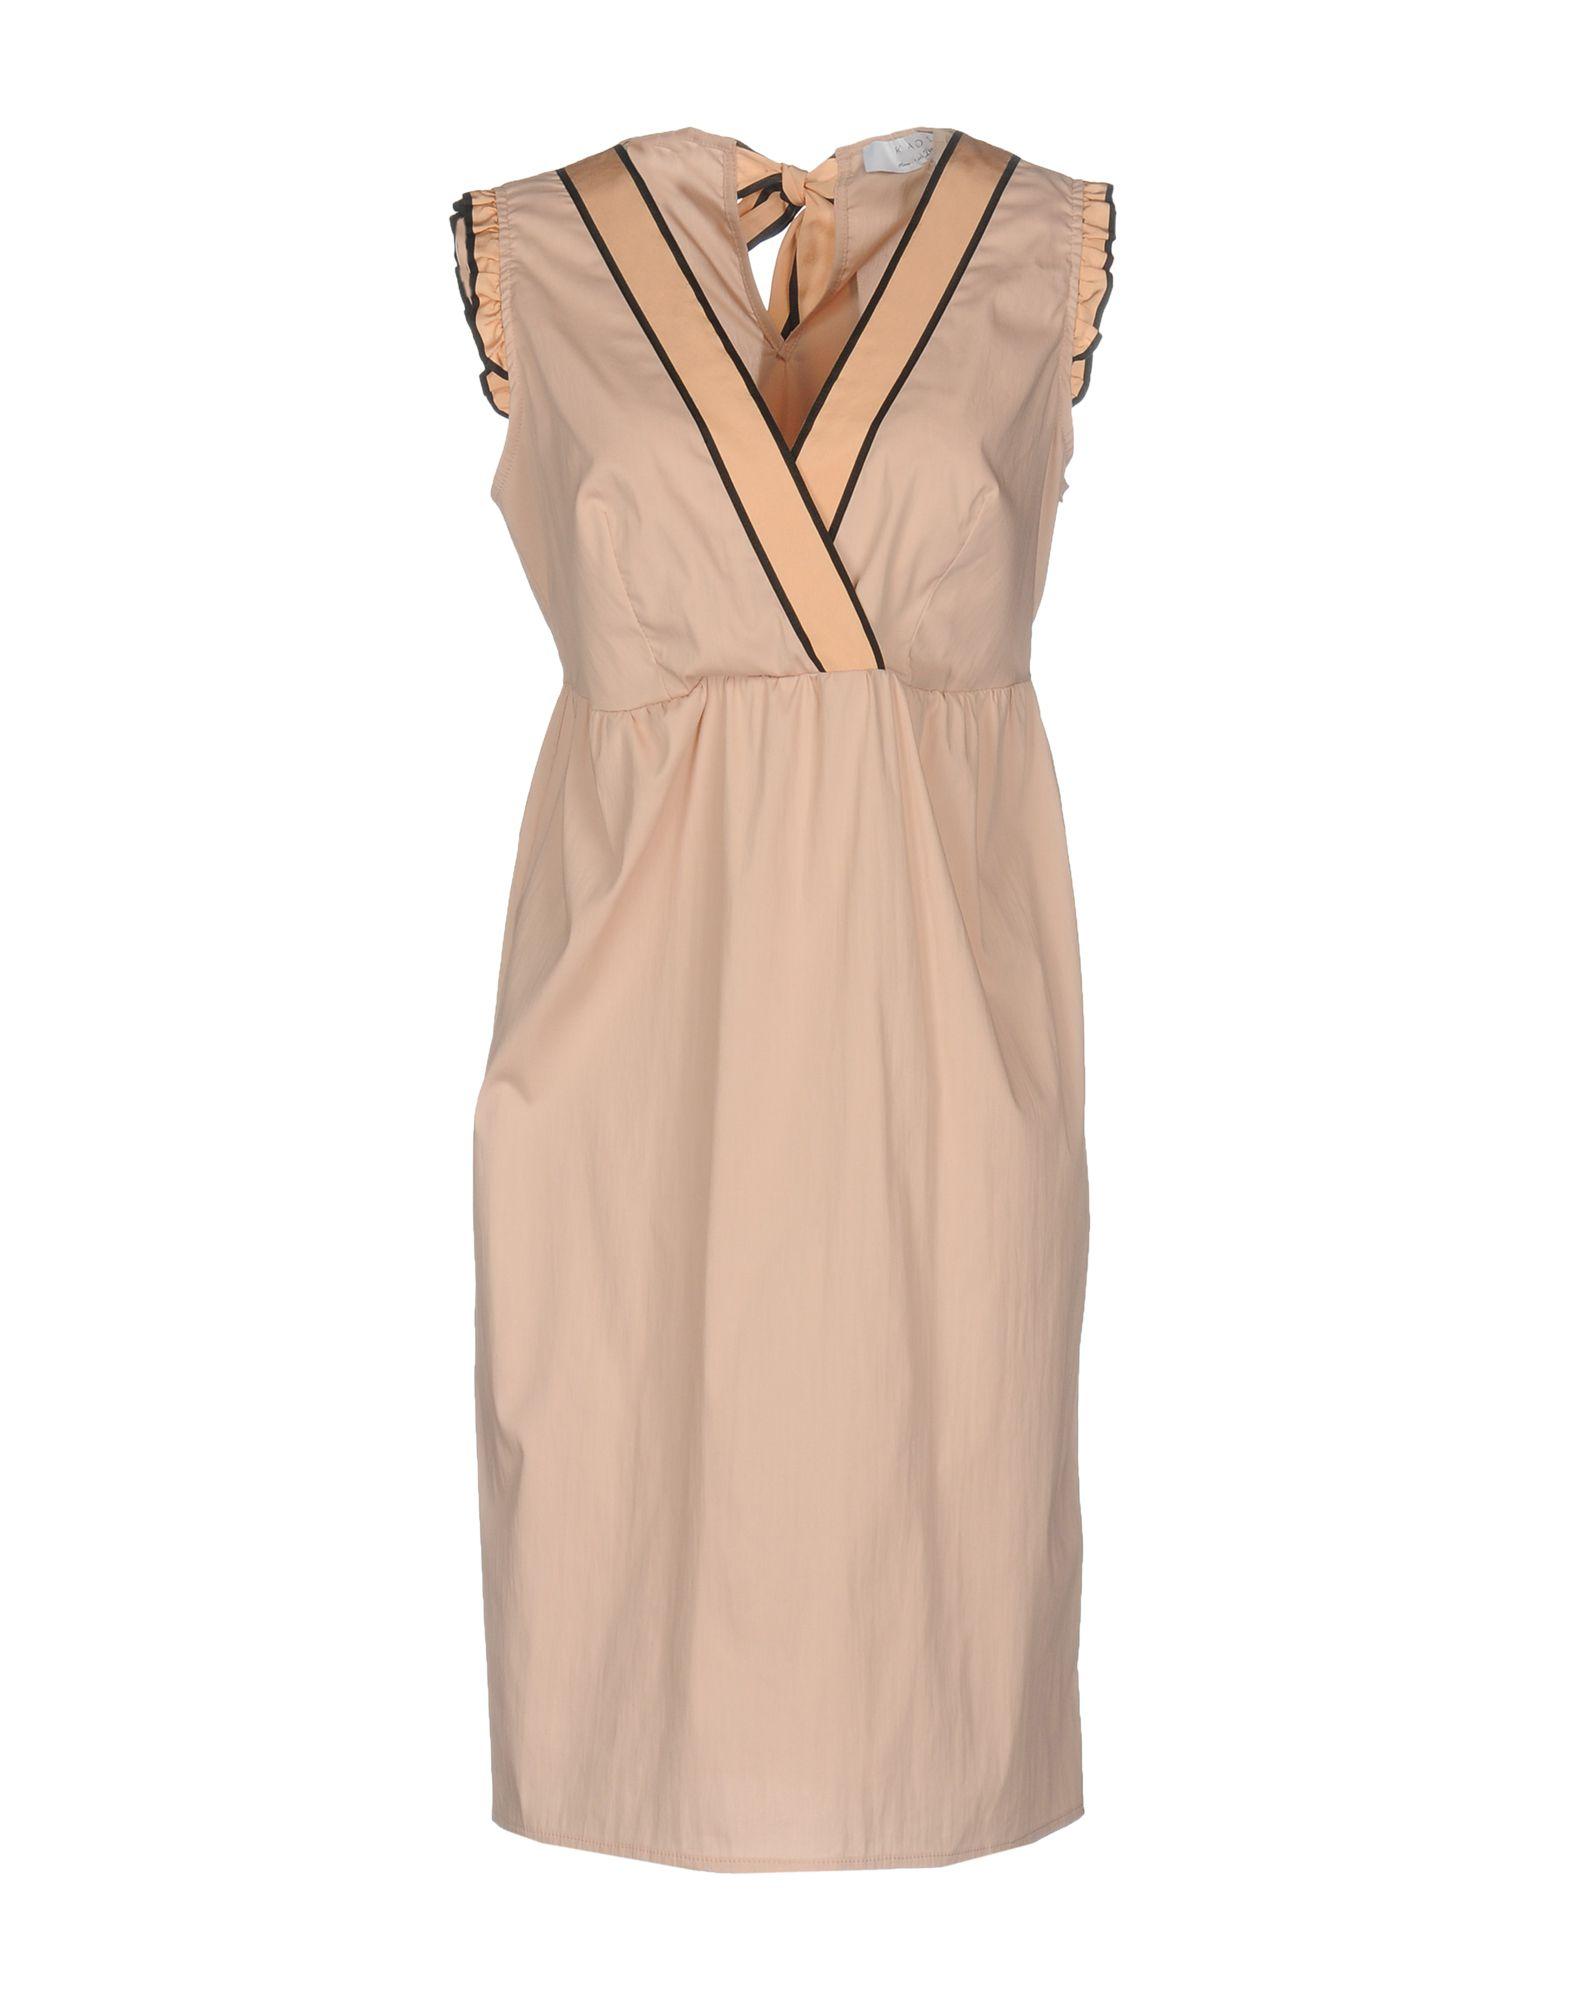 KAOS Damen Kurzes Kleid Farbe Rosa Größe 7 - broschei